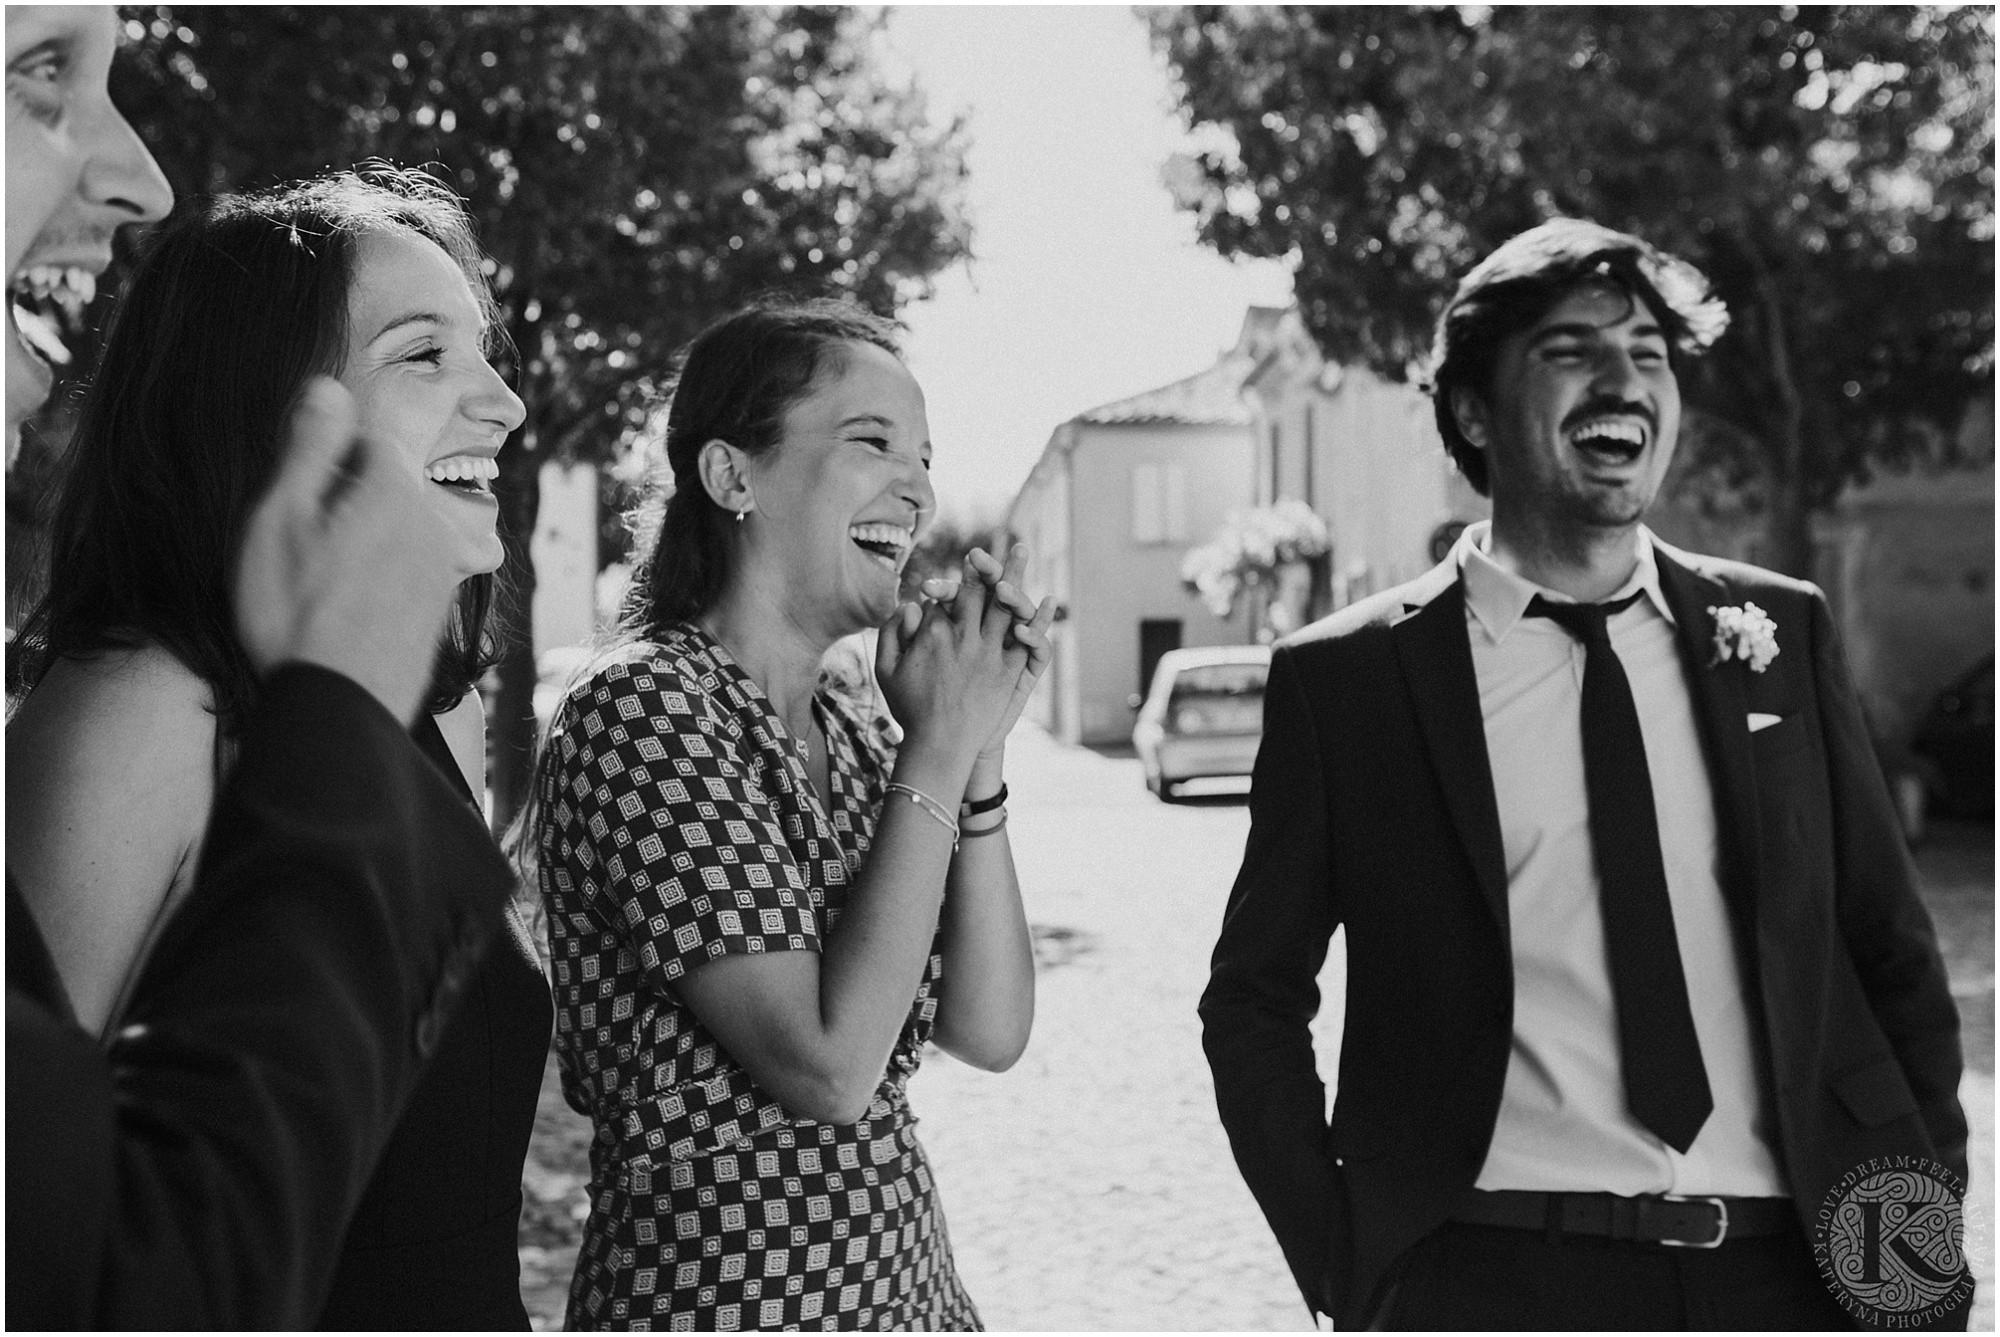 Kateryna-photos-photographe-mariage-vaucluse-provence-avignon-ferme-st-hugues_0039.jpg